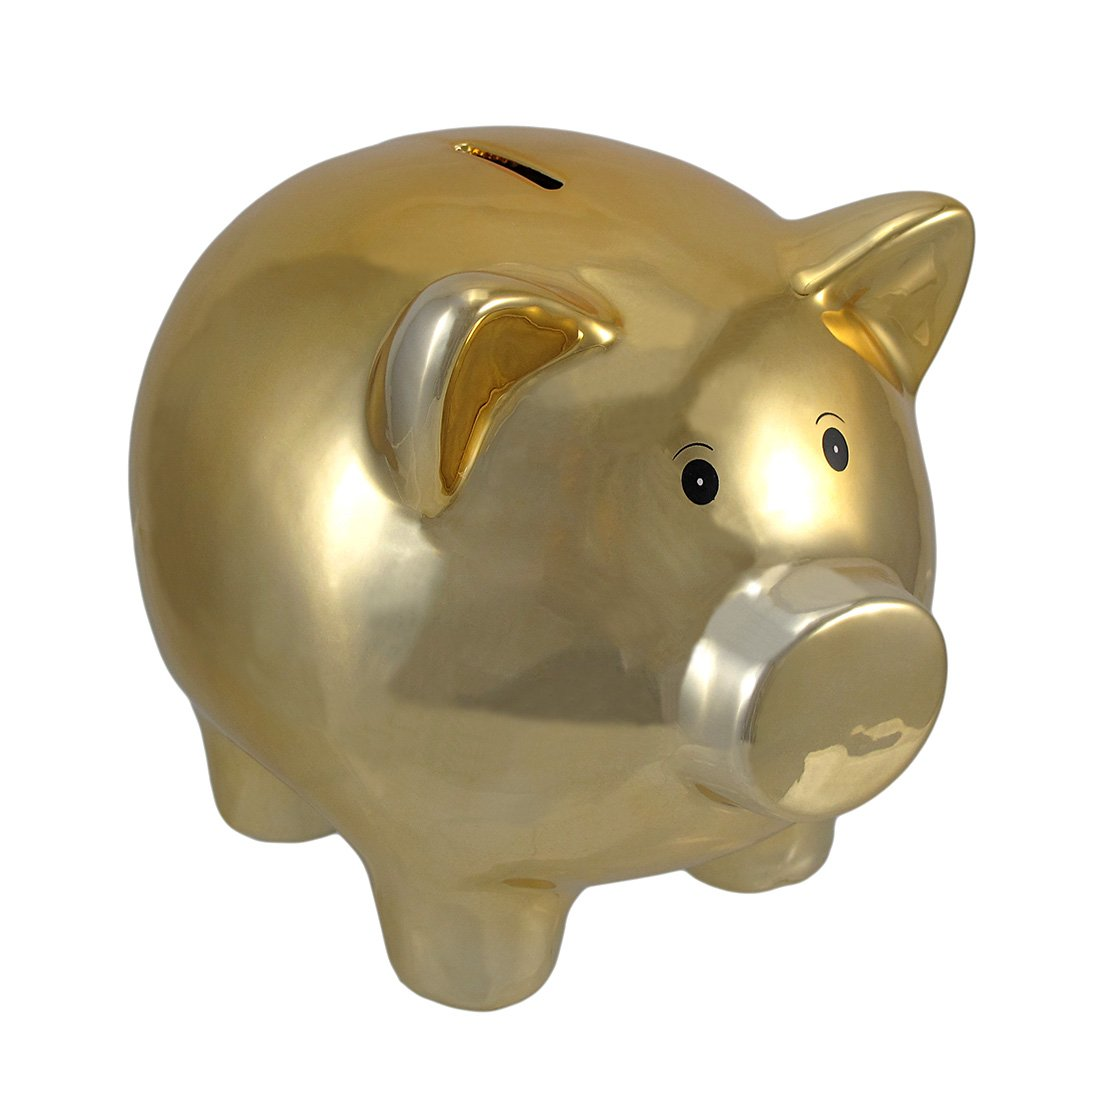 Things2Die4 Metallic Gold Plated Ceramic Piggy Bank 8 In.